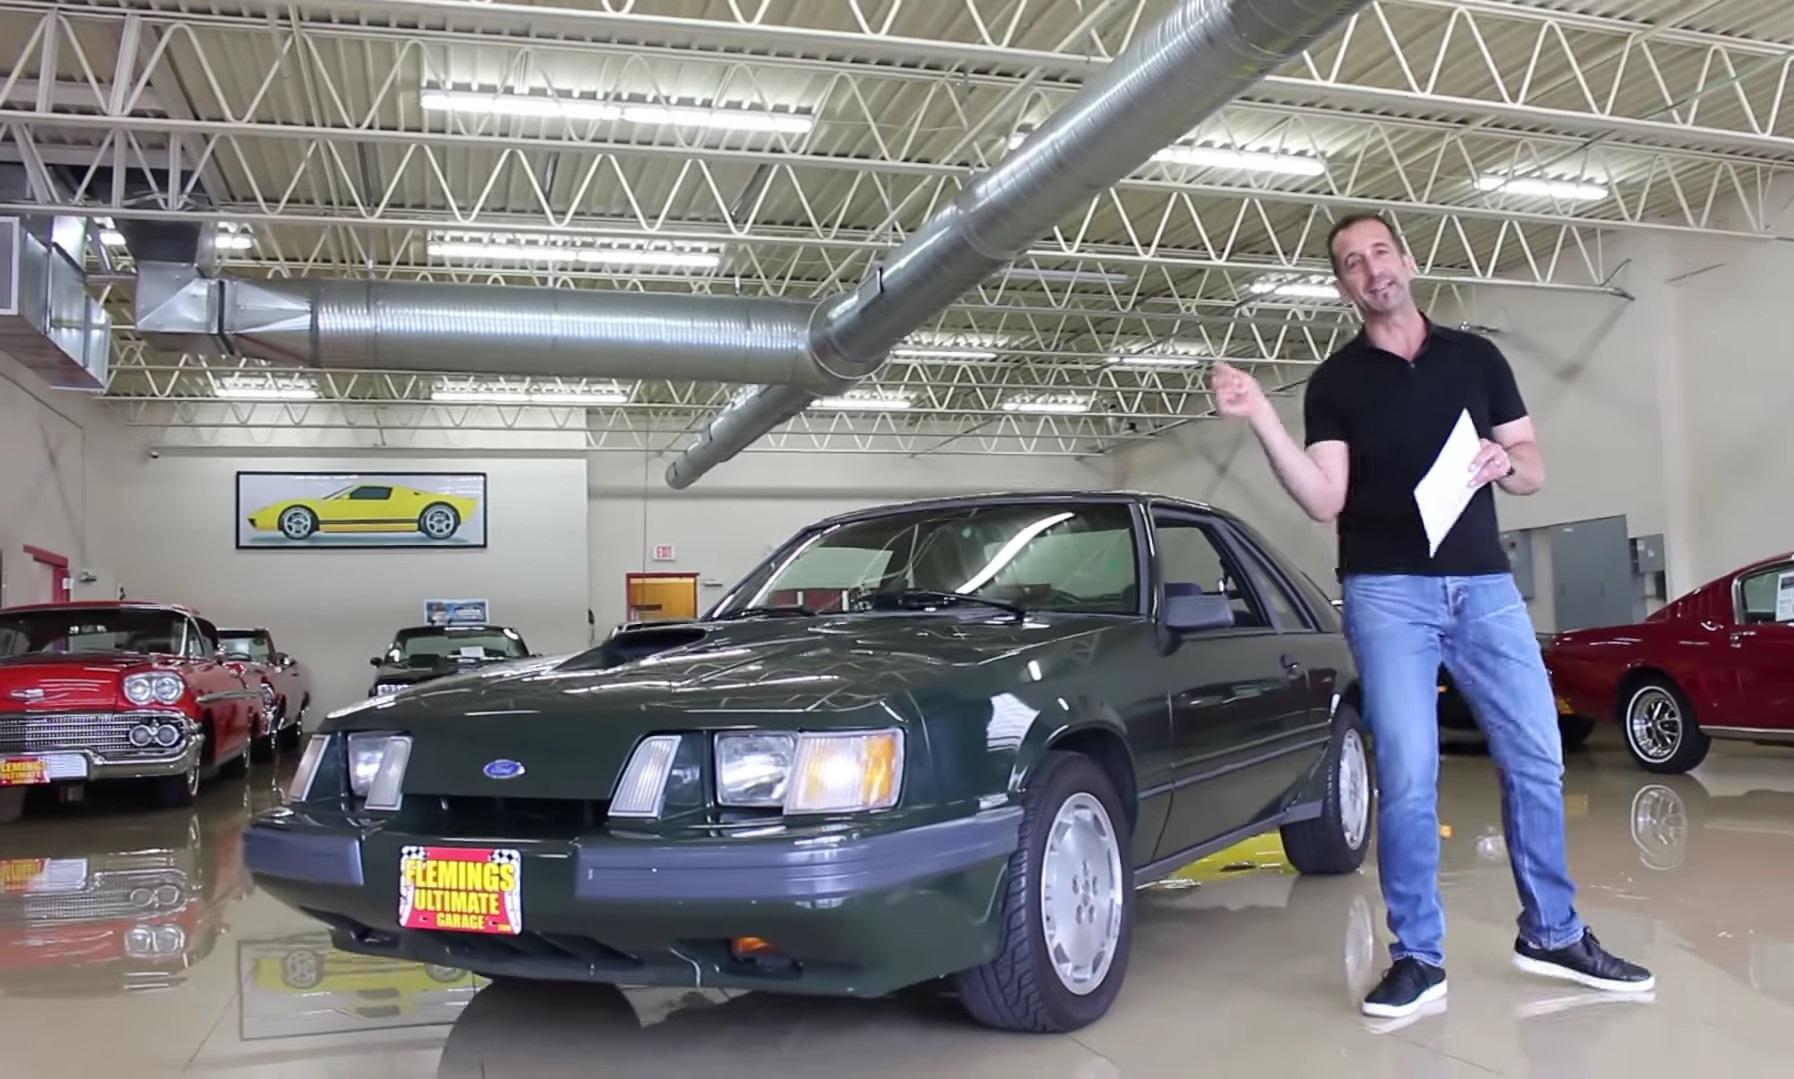 Video: 1985 Ford Mustang SVO Hertz Walkthrough + Test Drive